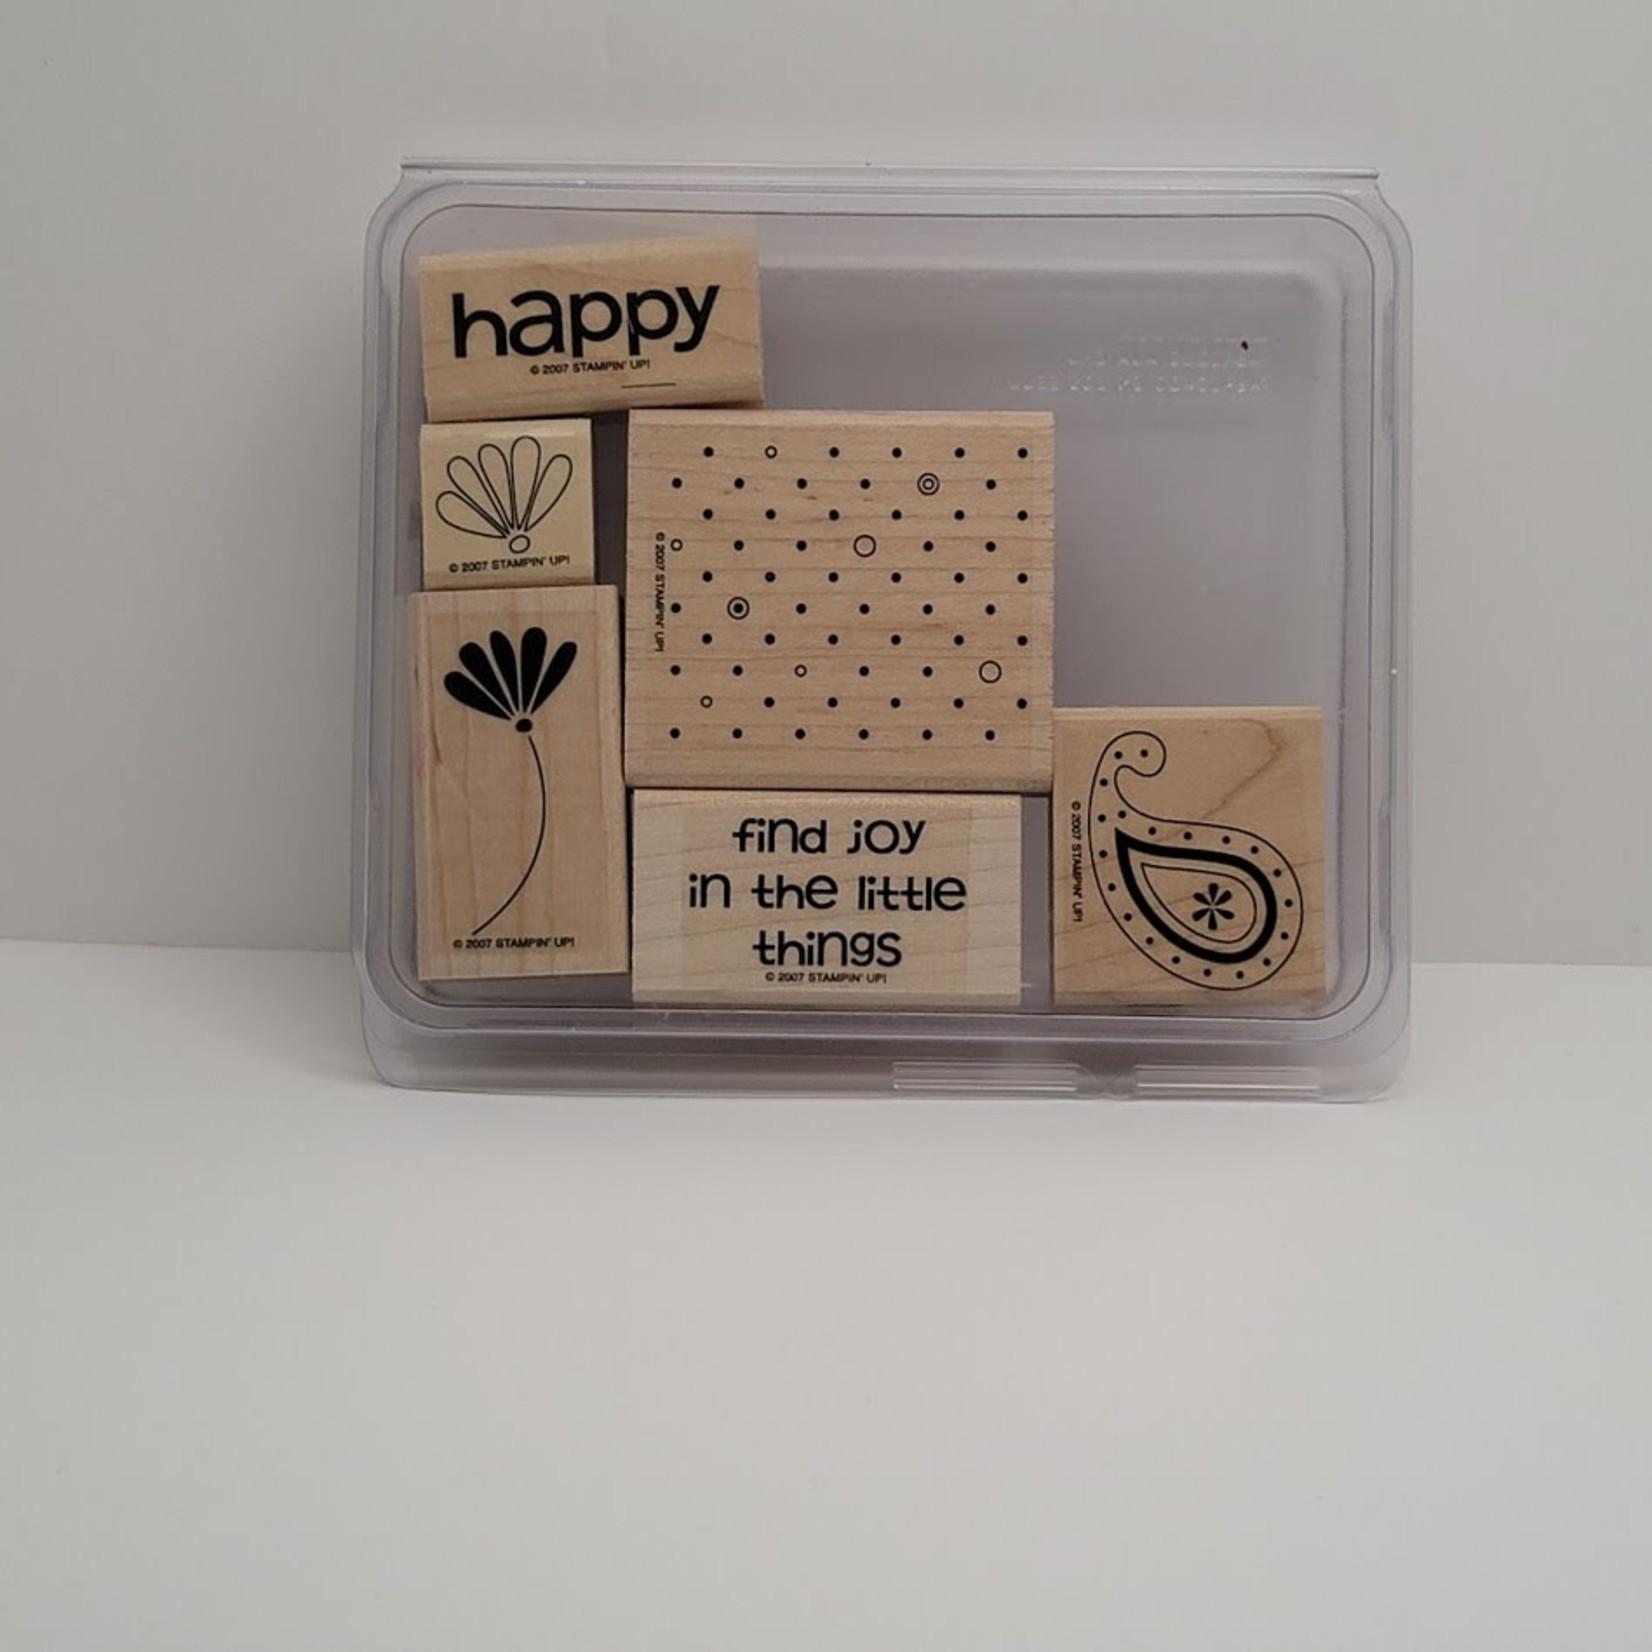 Stampin' Up Stampin' Up - Wooden Stamp Set - Polka Dots and Paisley